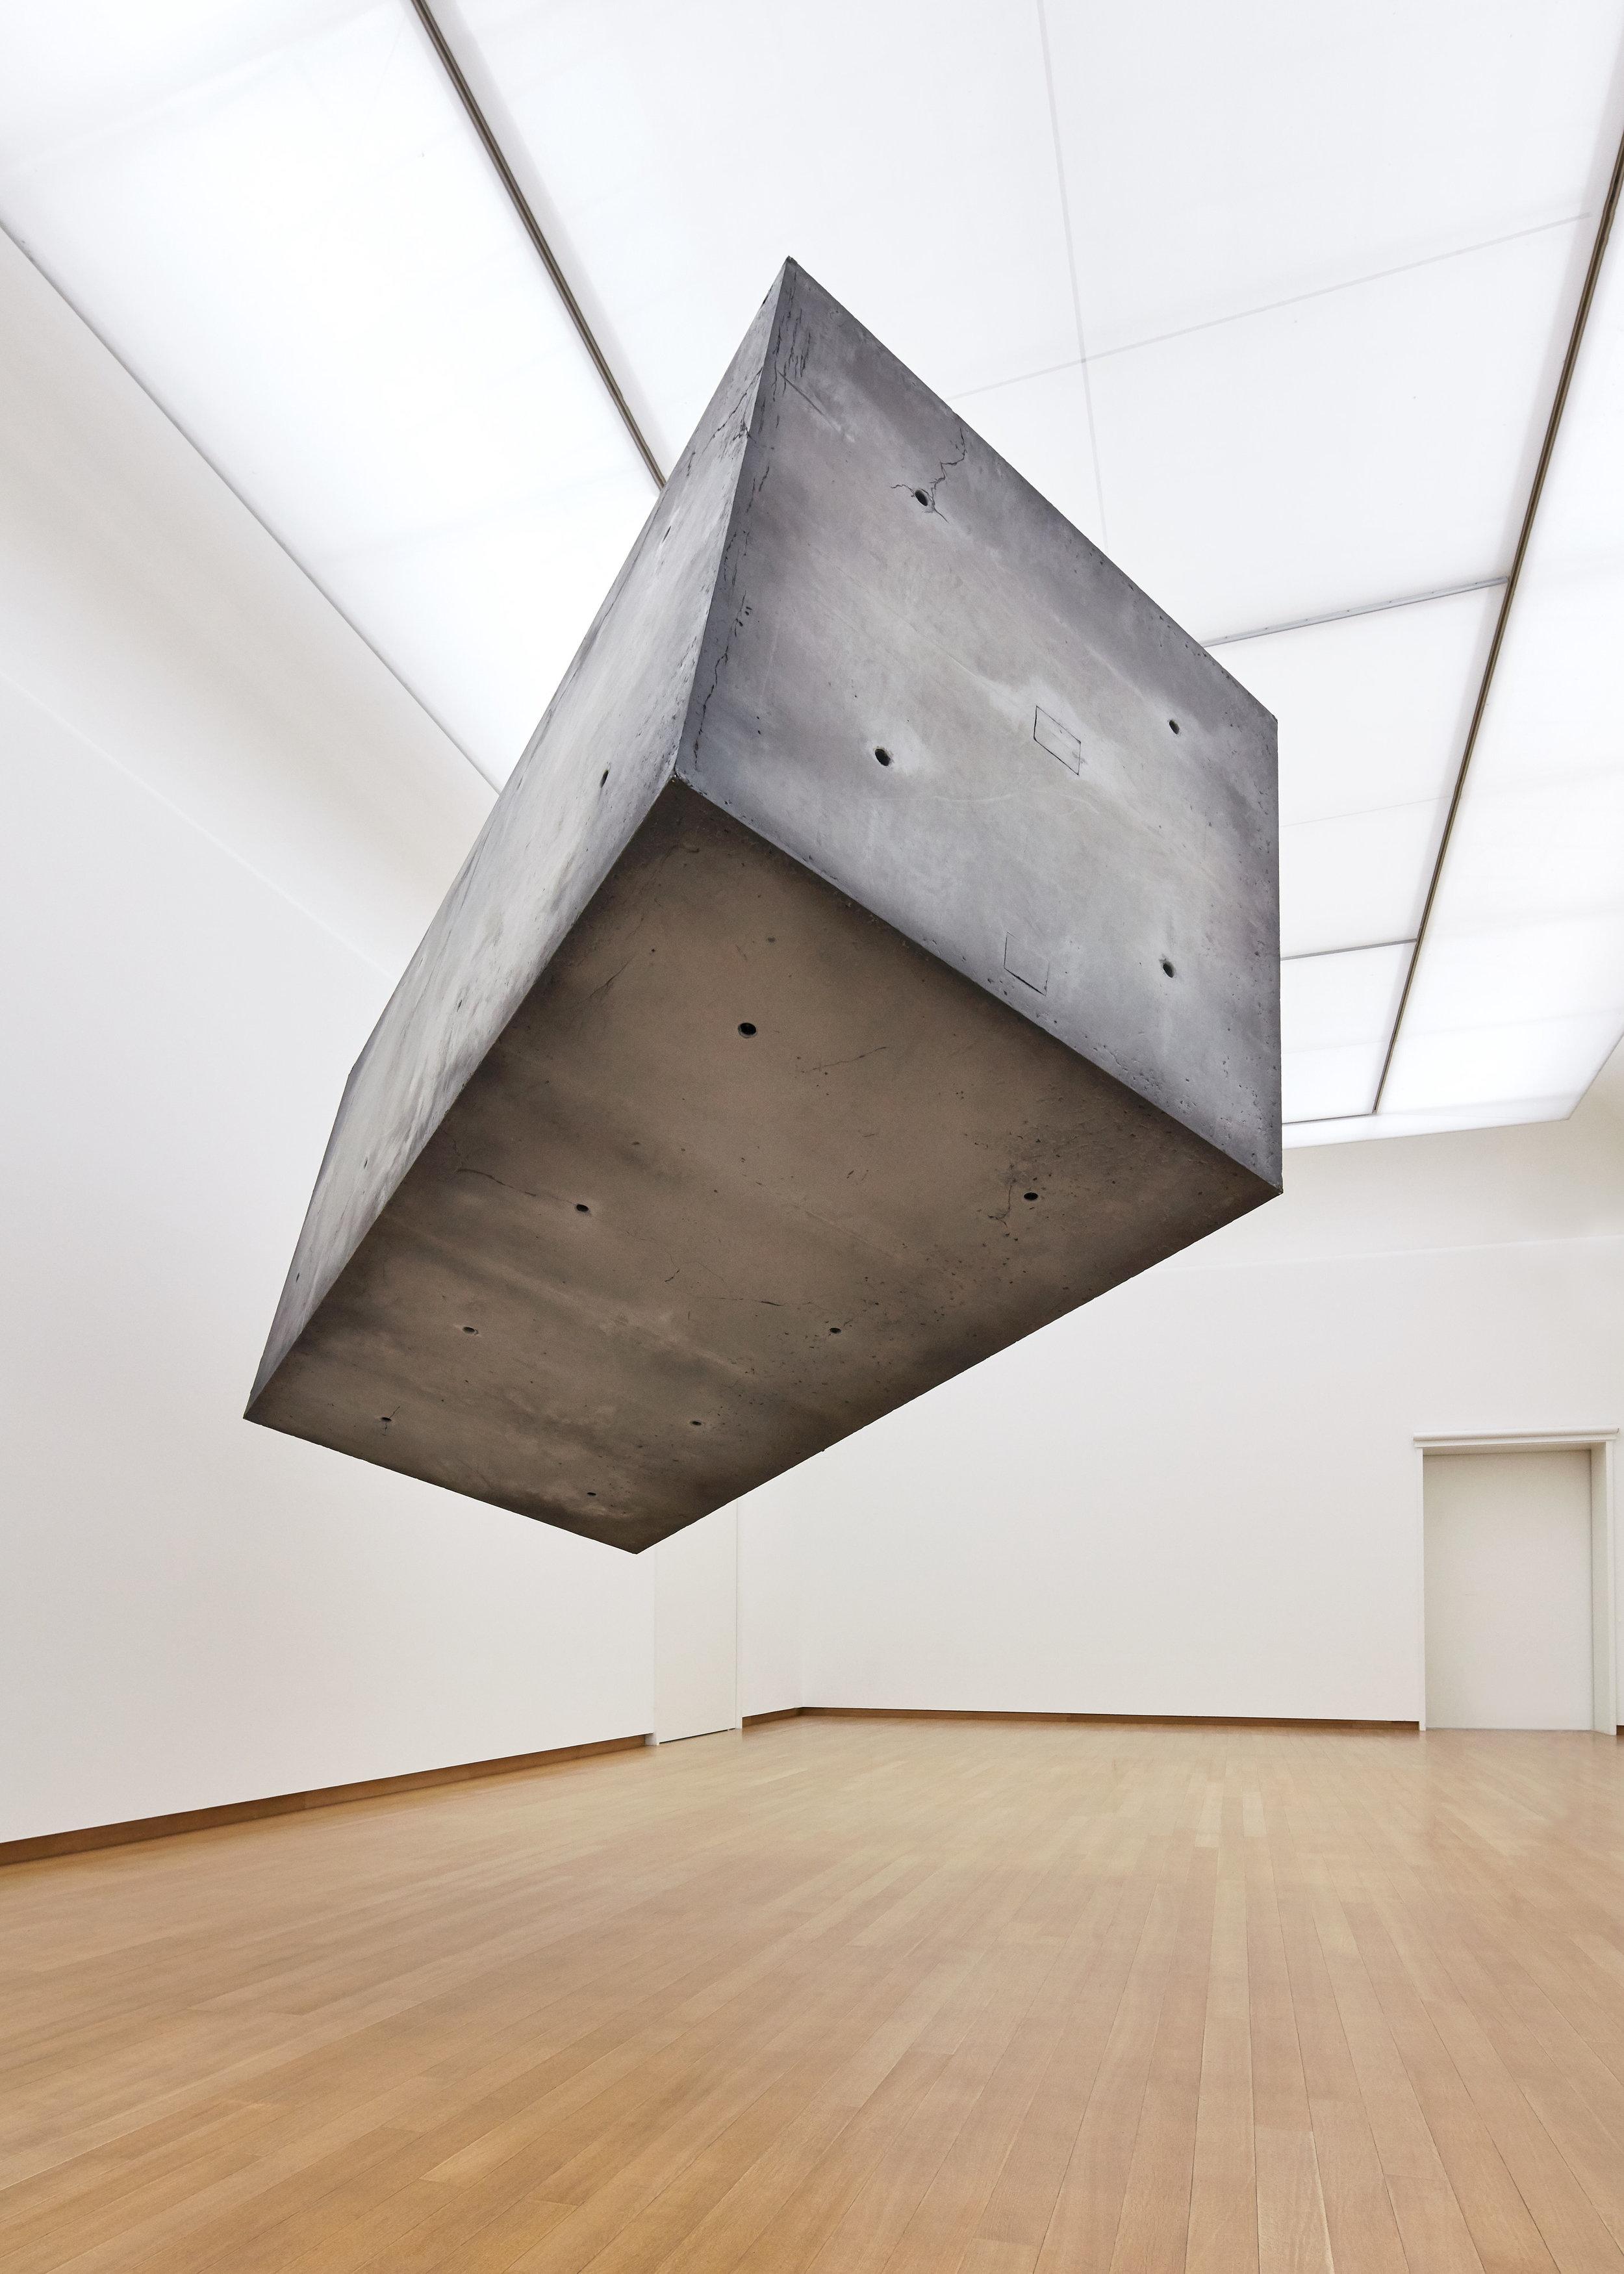 Stedelijk Museum, Amsterdam - Photo: Ronald Smits